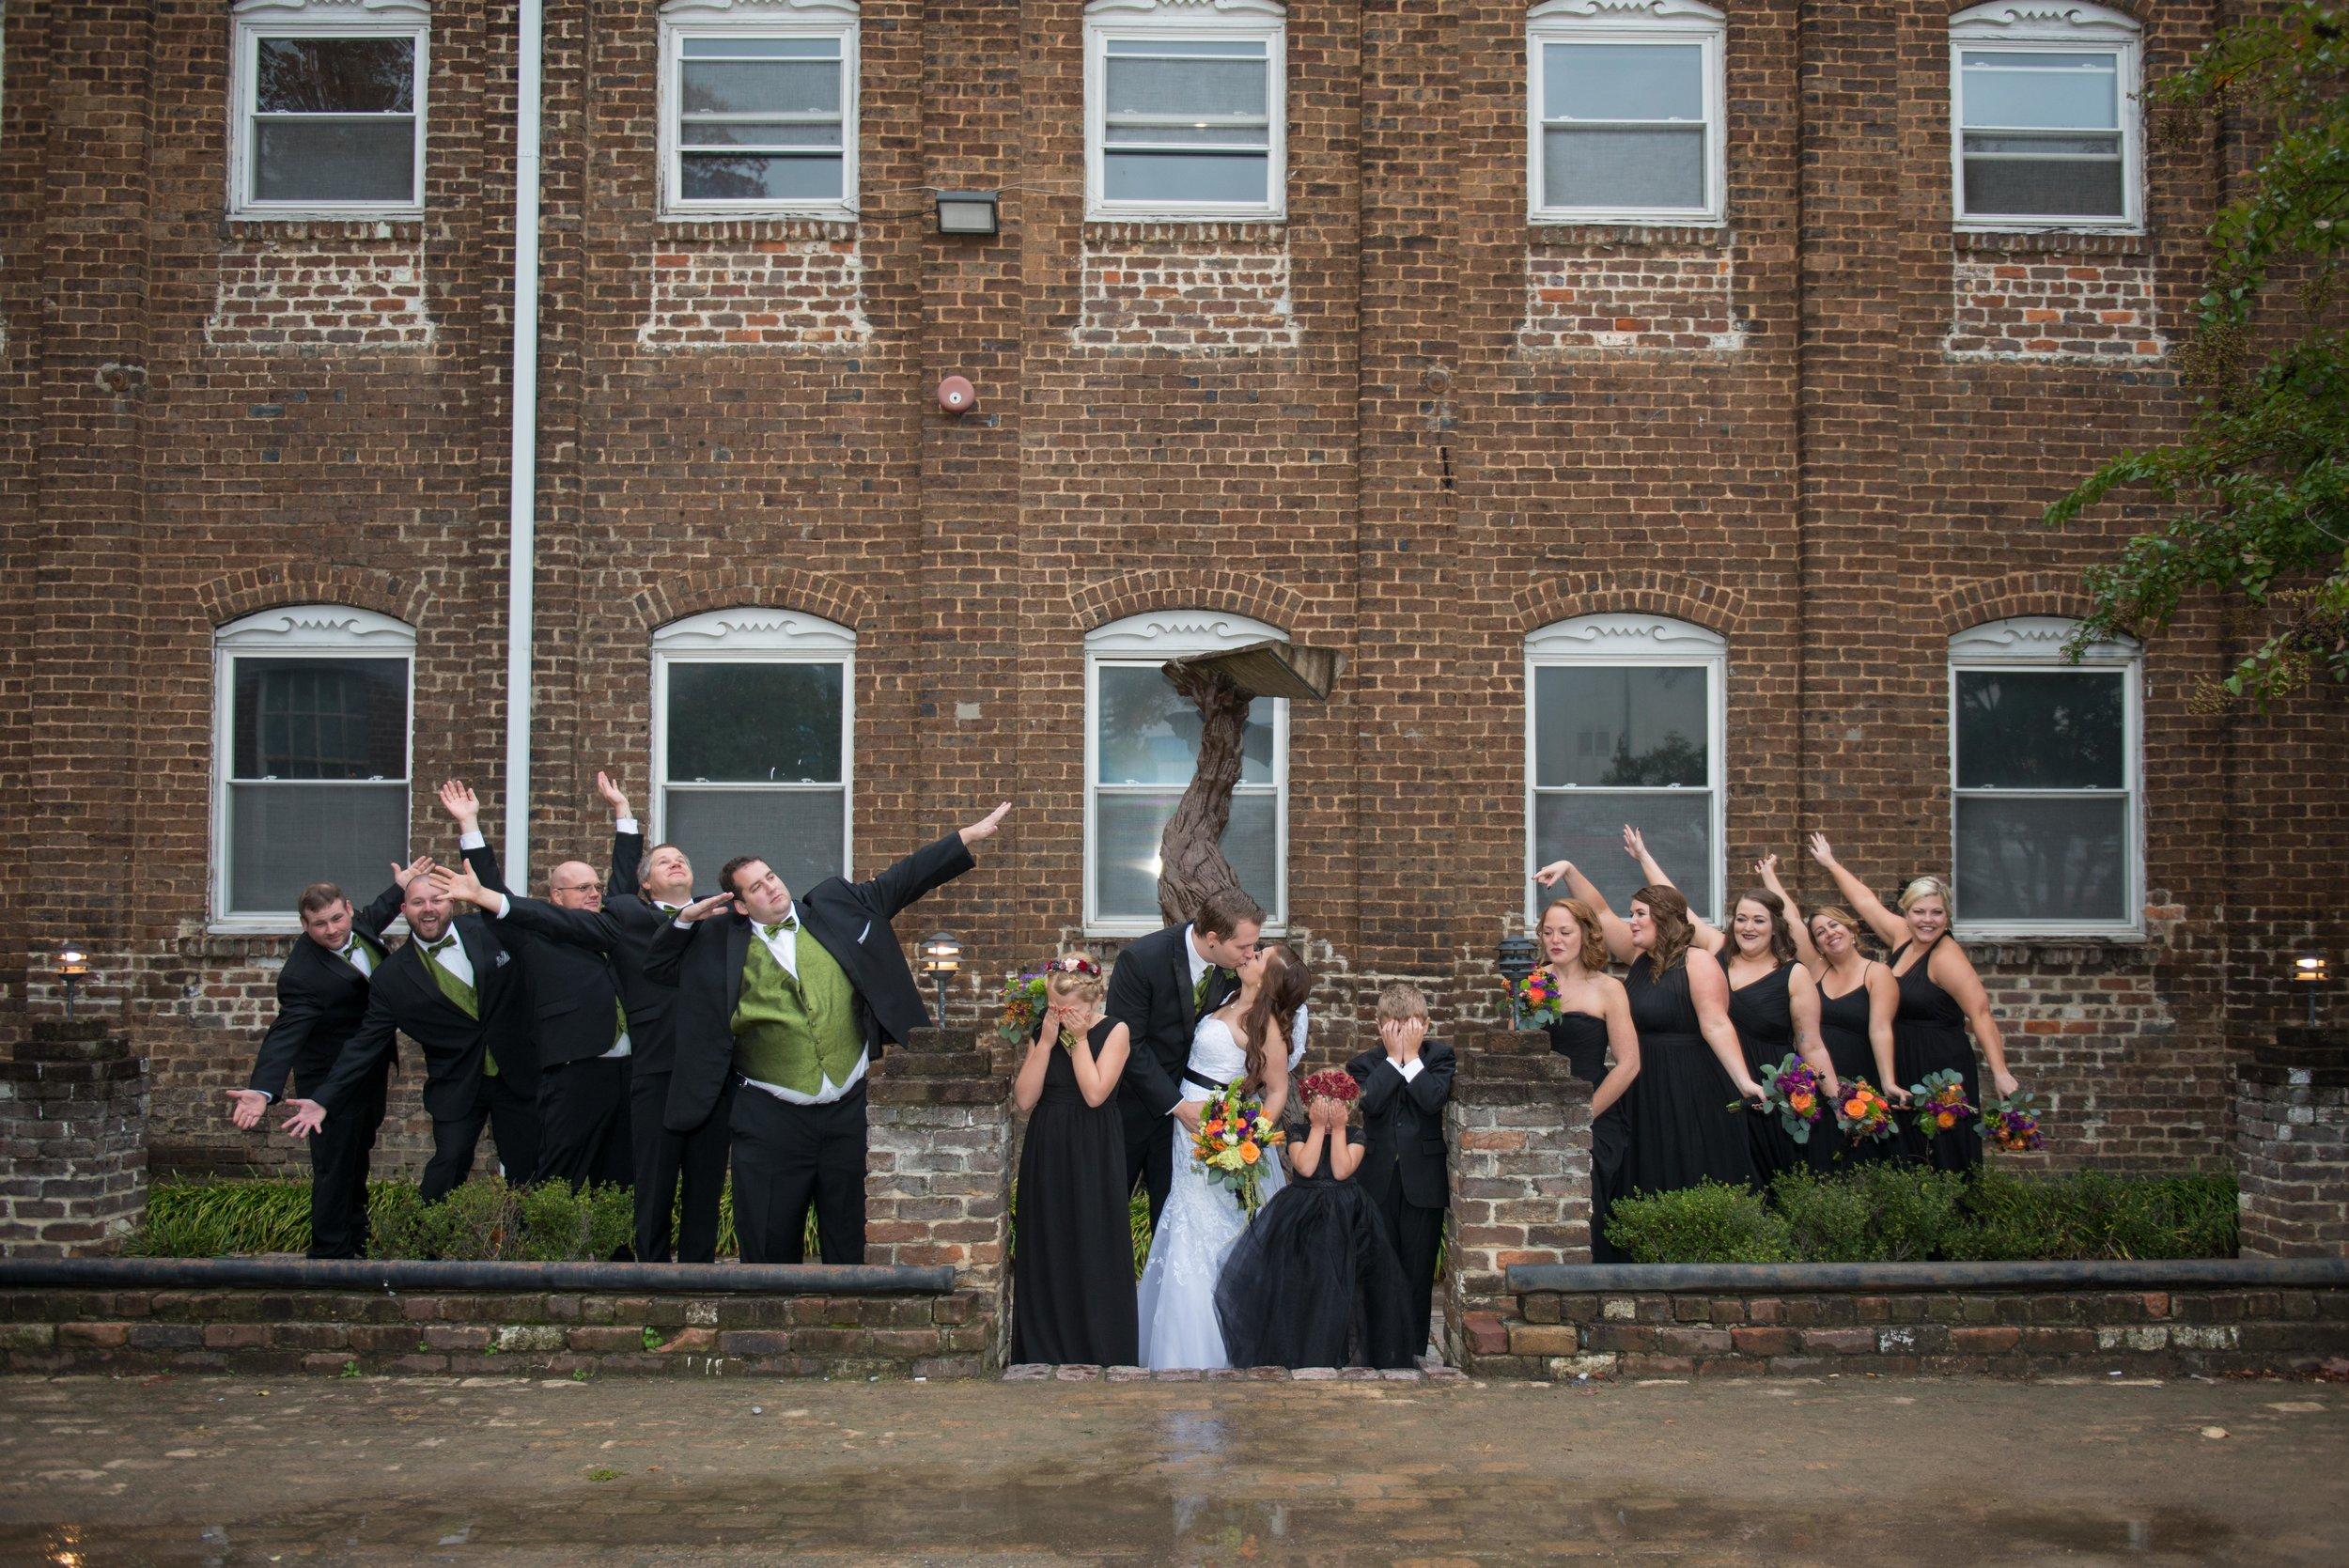 00001_Parker-Wedding-Sp-64.jpg